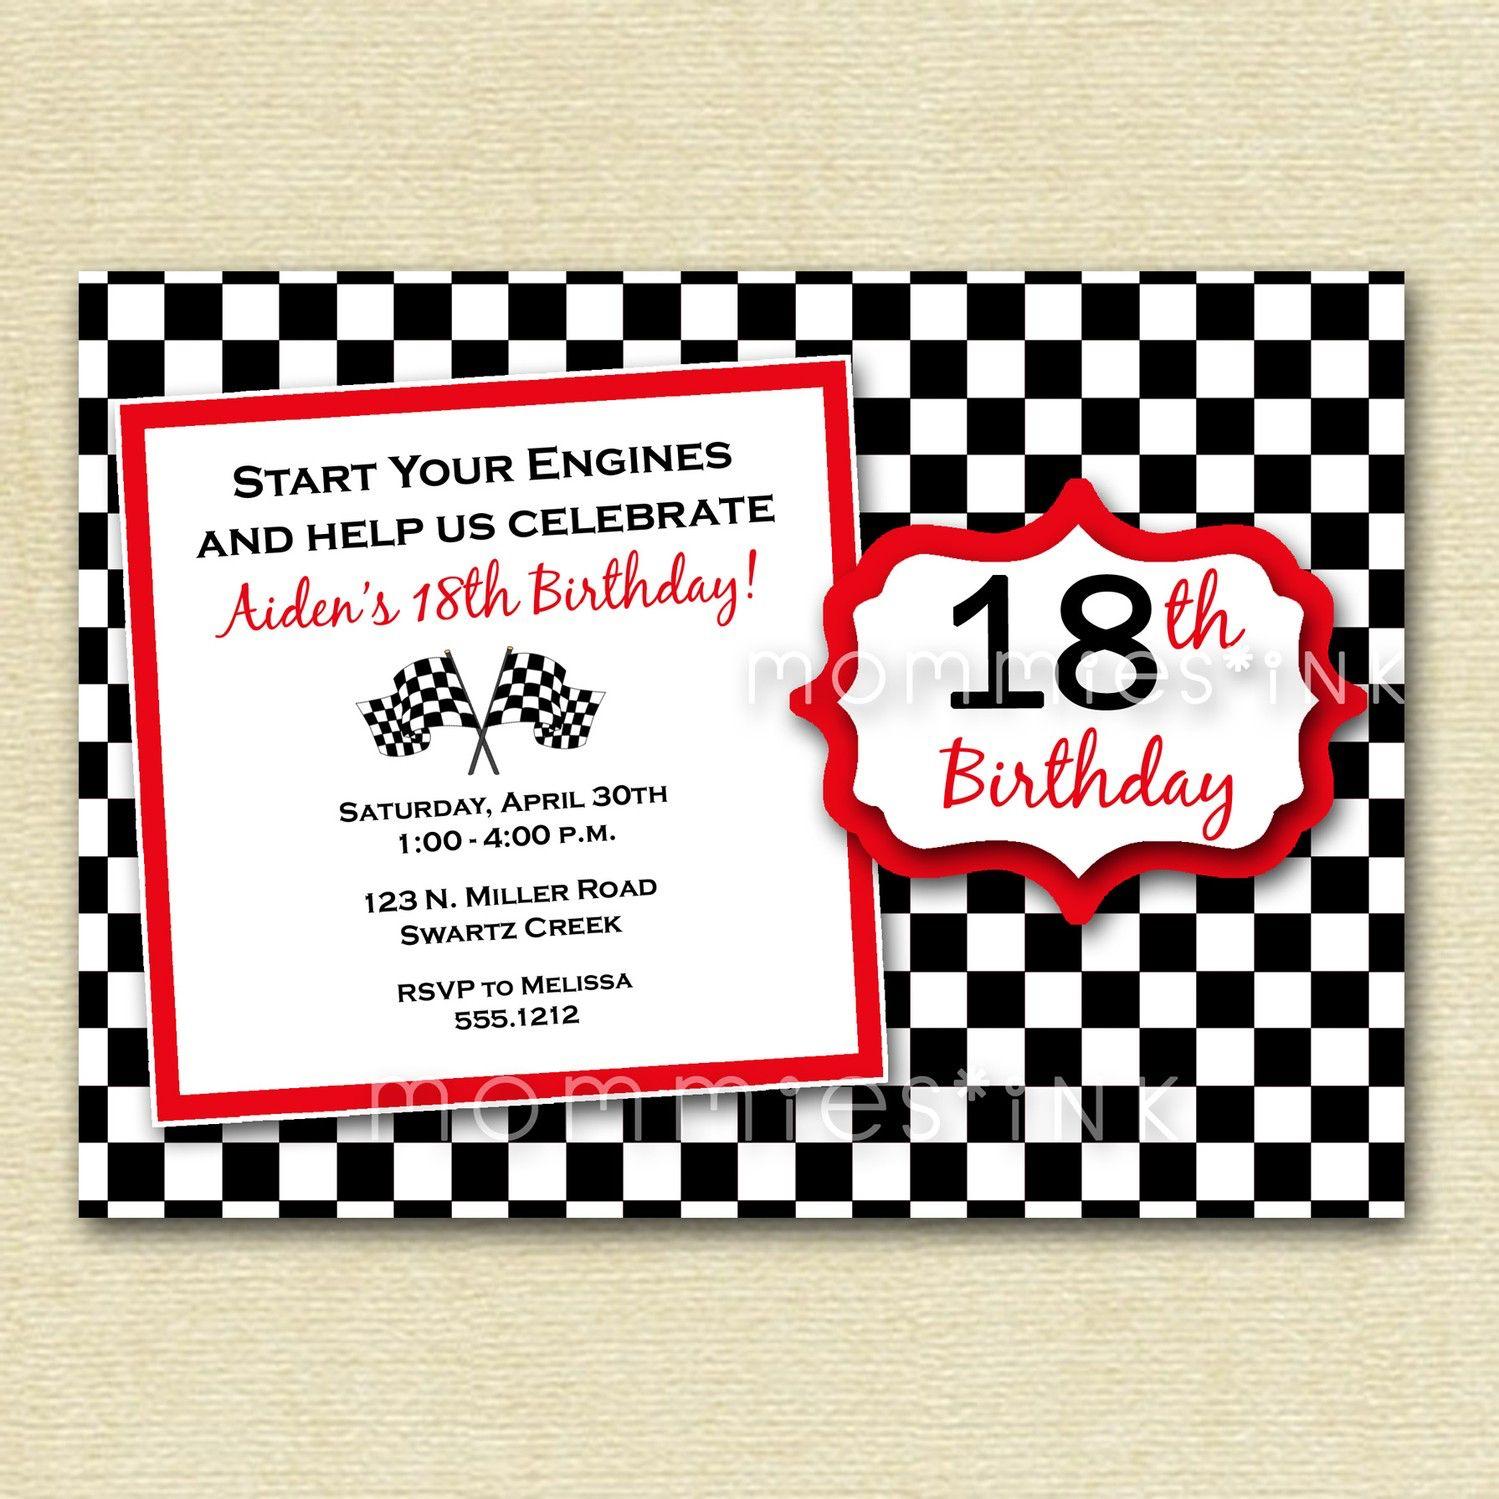 Checkered Flag Birthday Party Invitation - PRINTABLE INVITATION ...